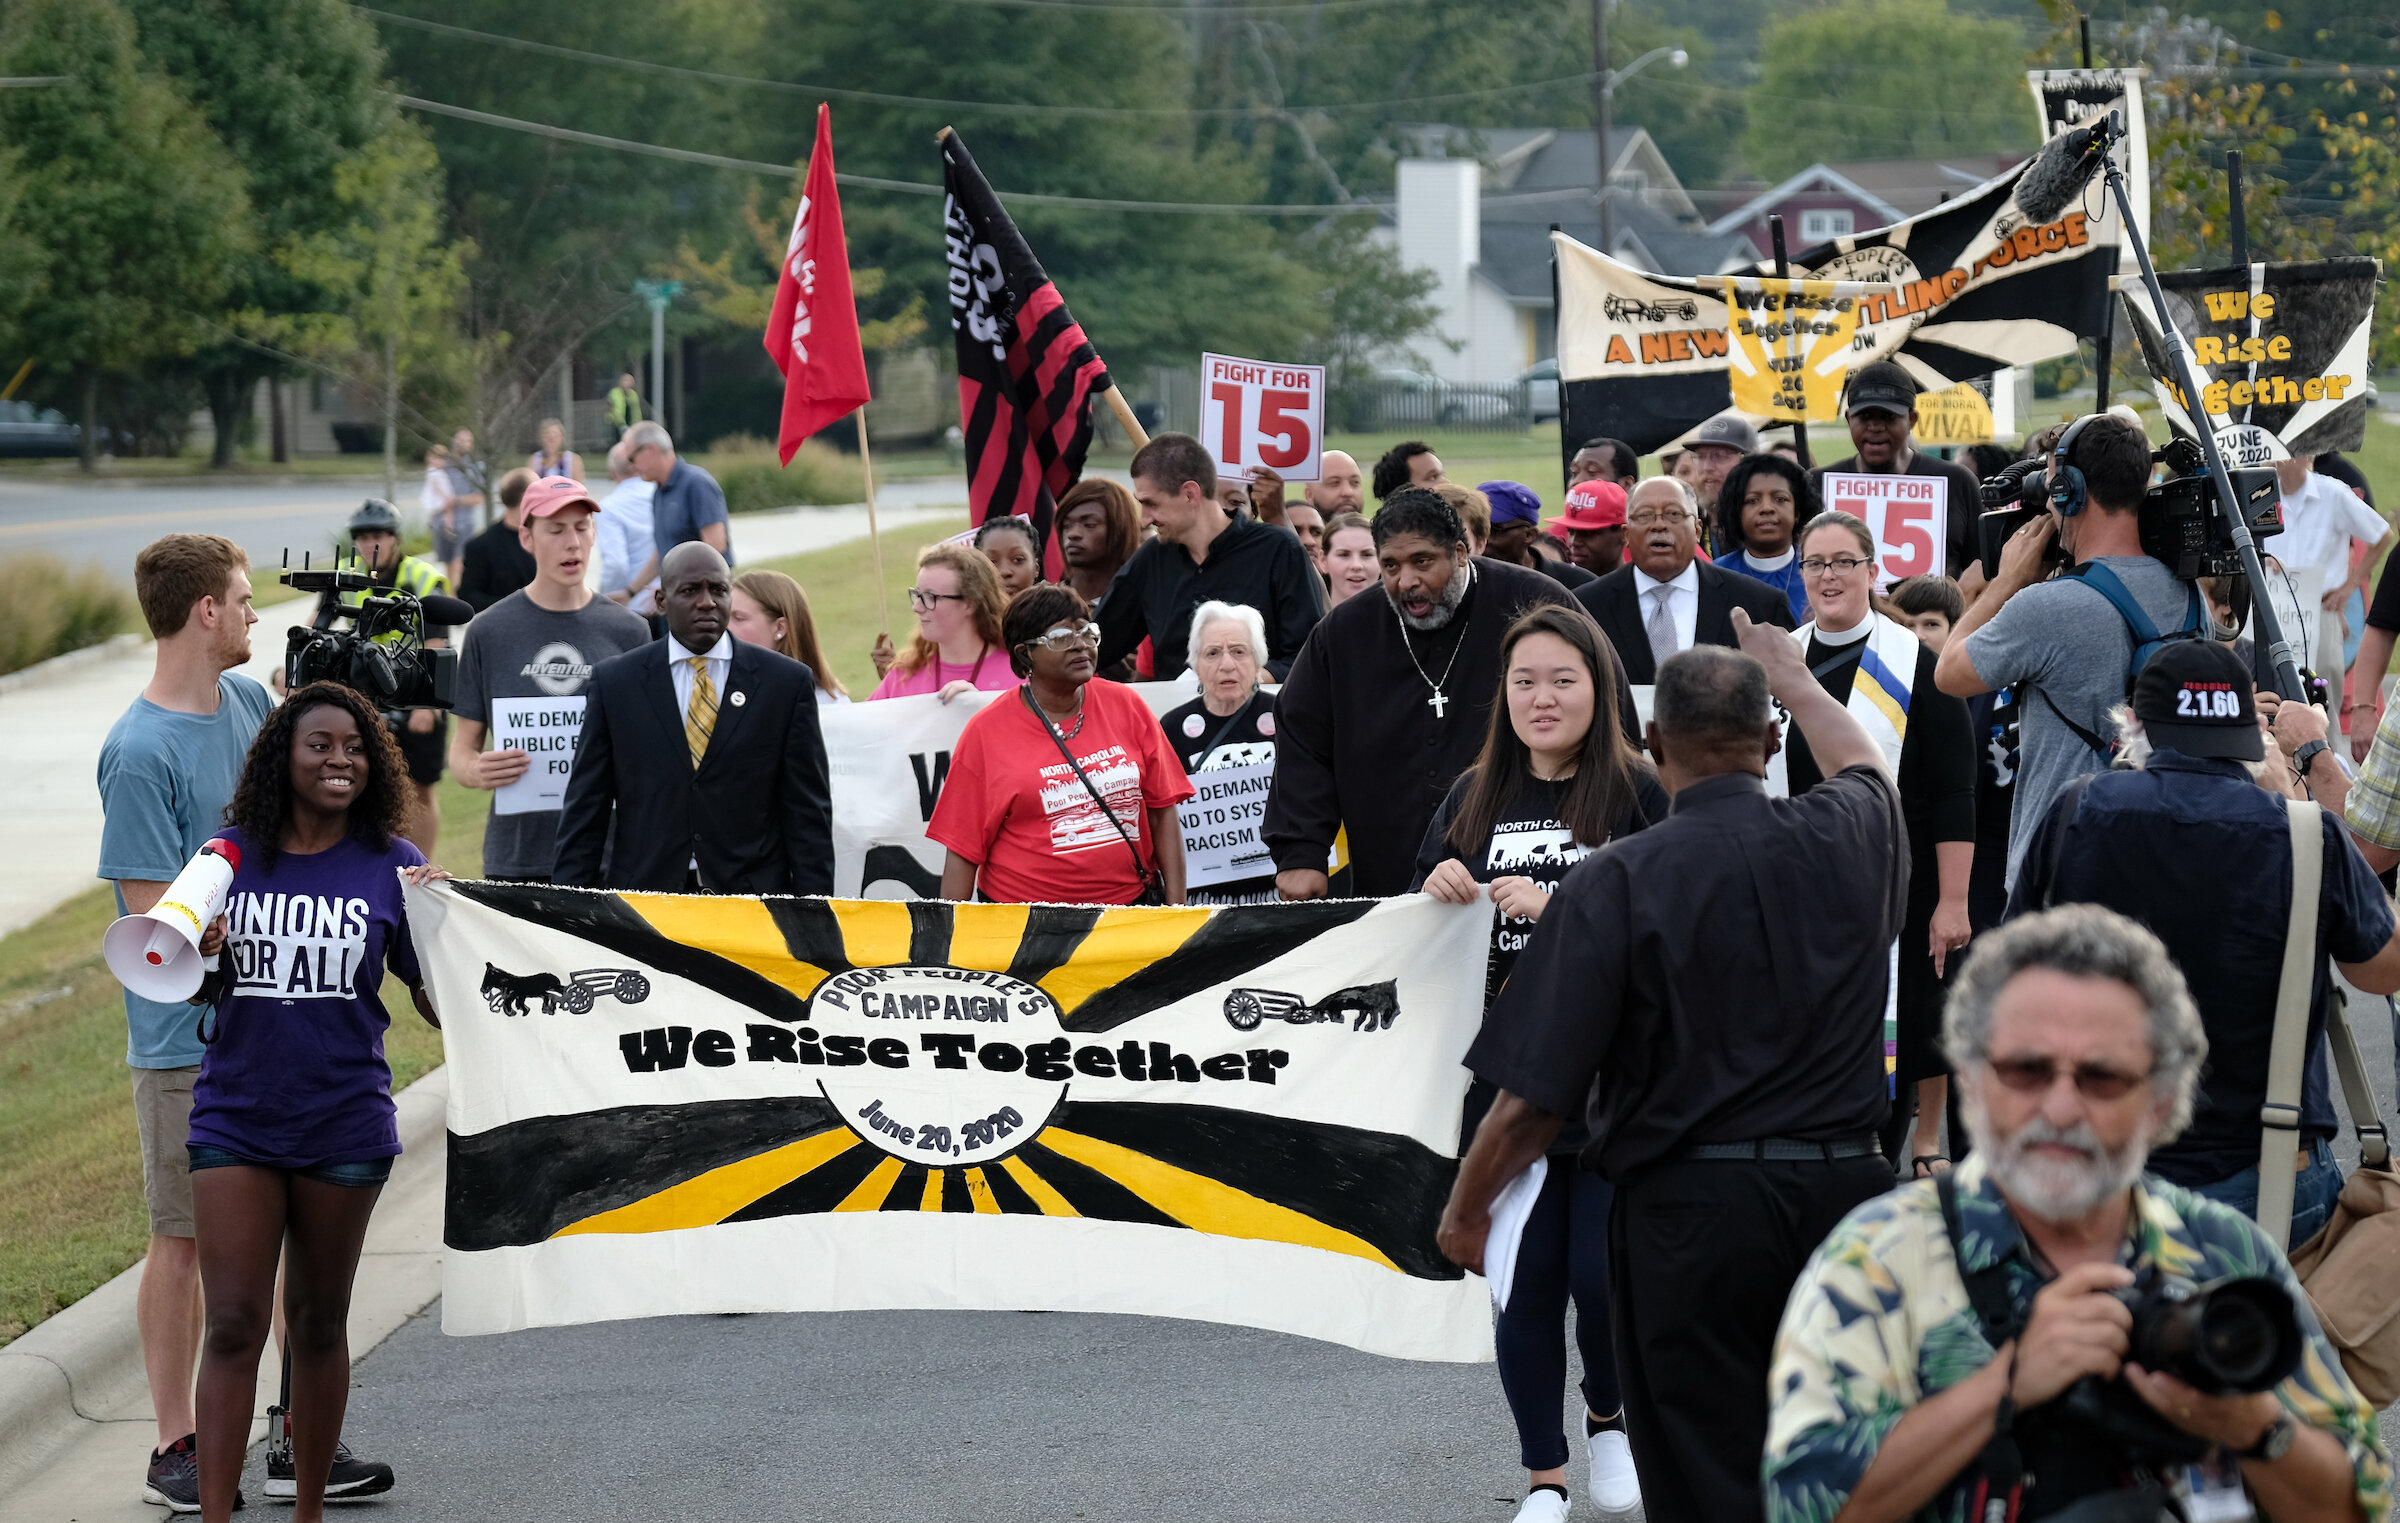 2019 0930 NC Greensboro MORE march by Steve Pavey HopeinFocus-48.jpg